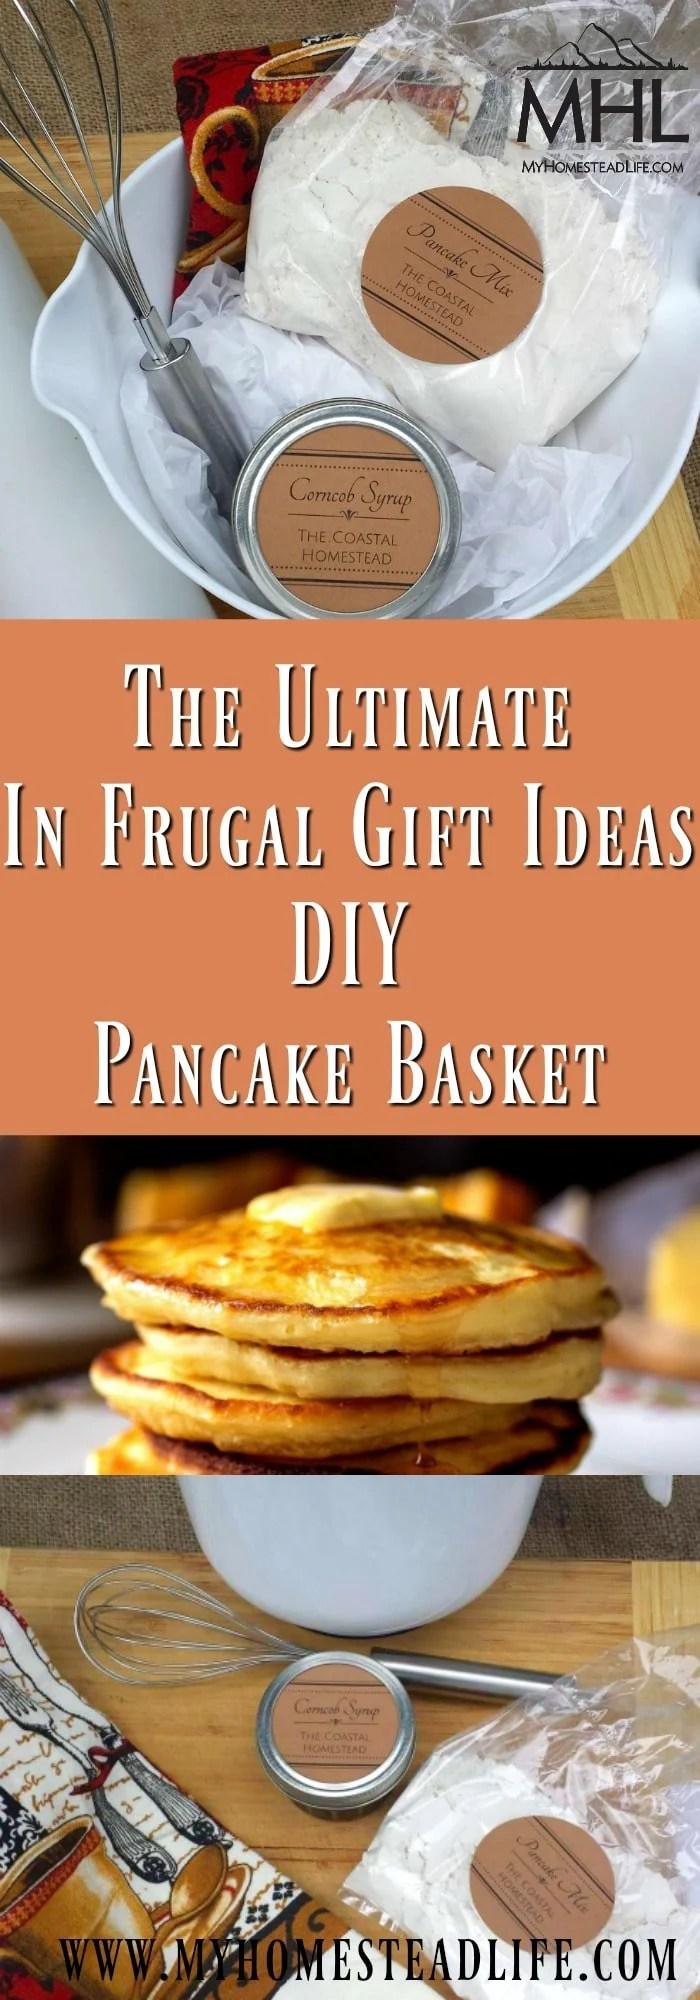 The Ultimate In Frugal Gift Ideas- DIY Pancake Basket